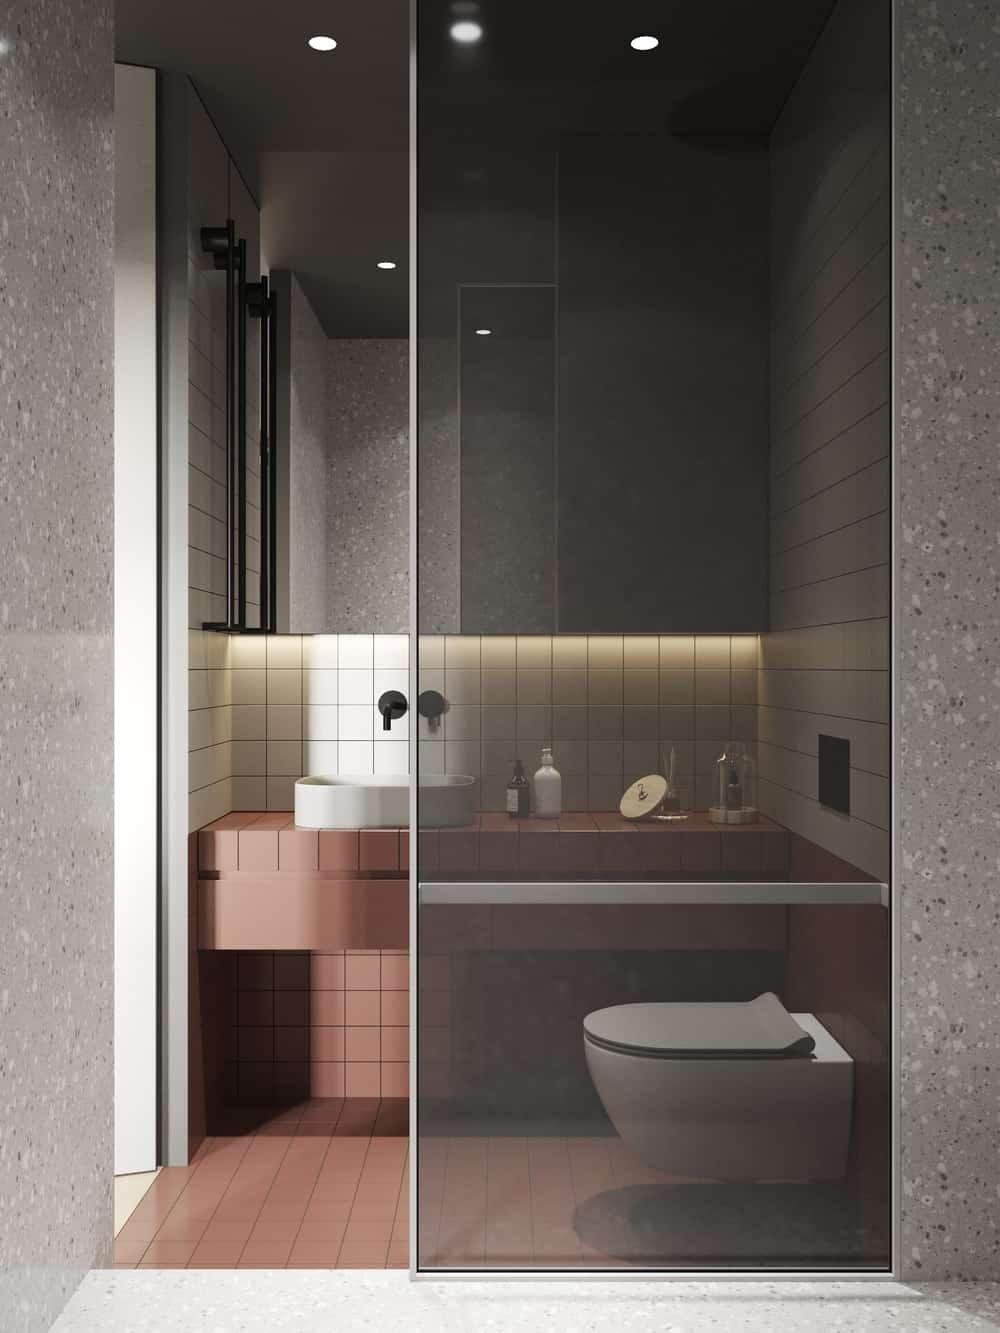 Bathroom in the Goose designed by Cartelle Design.